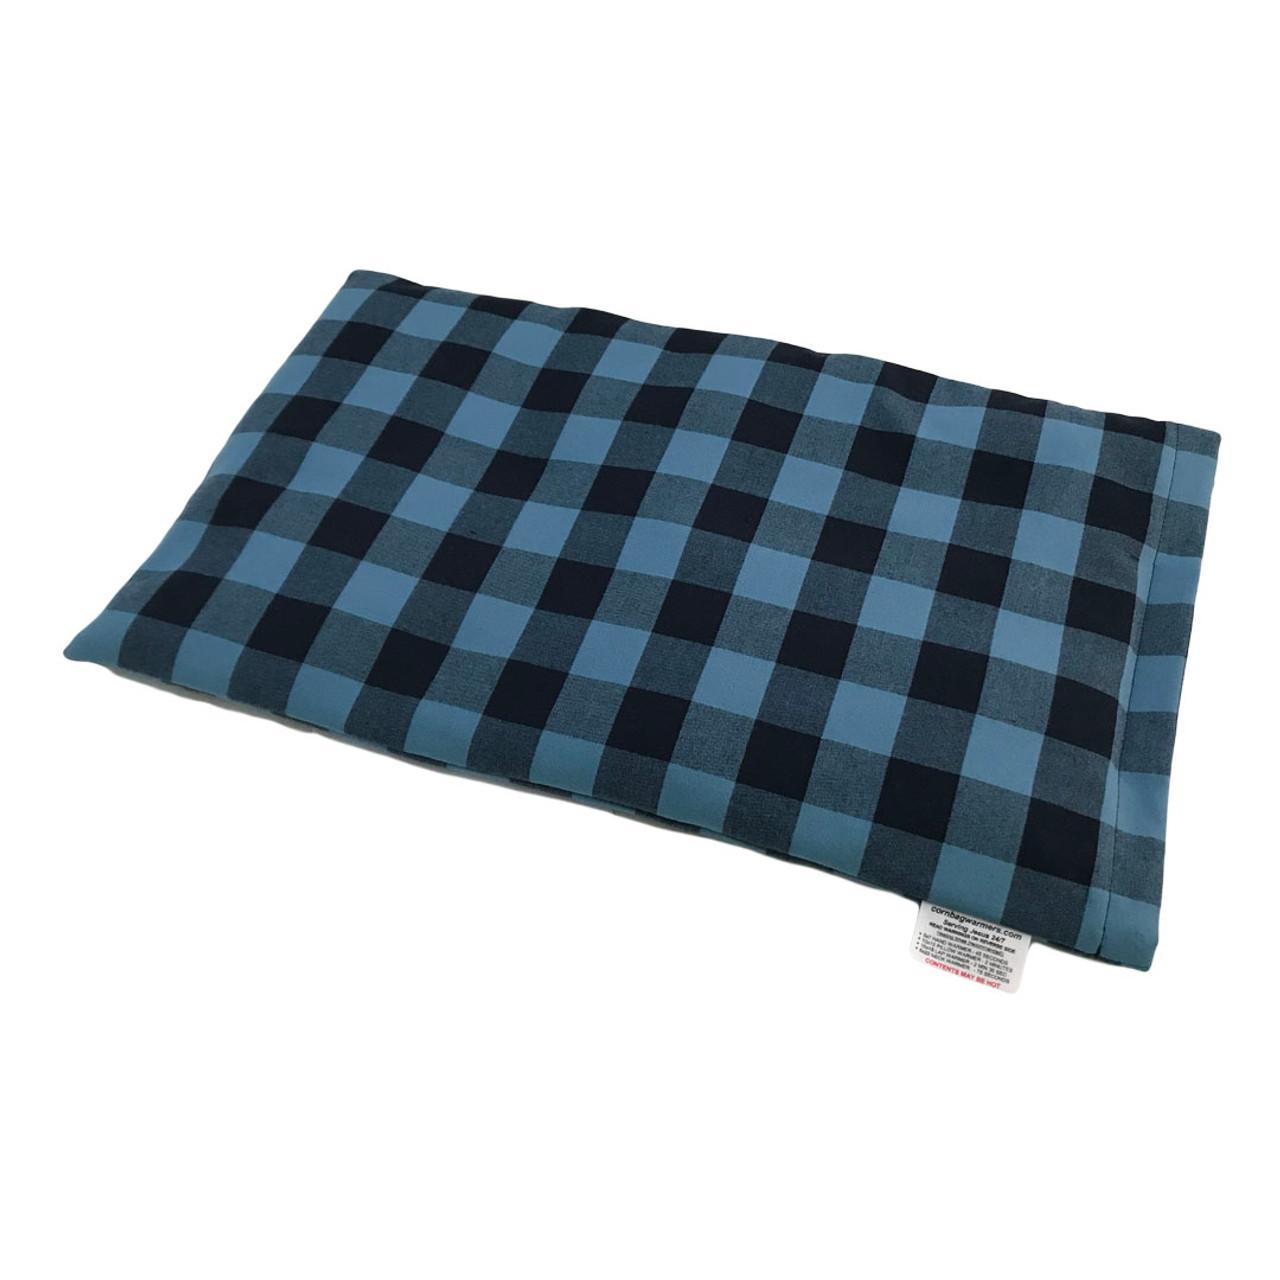 Light Blue & Black Plaid Lap Warmer Corn Bag Warmer -Beautiful!